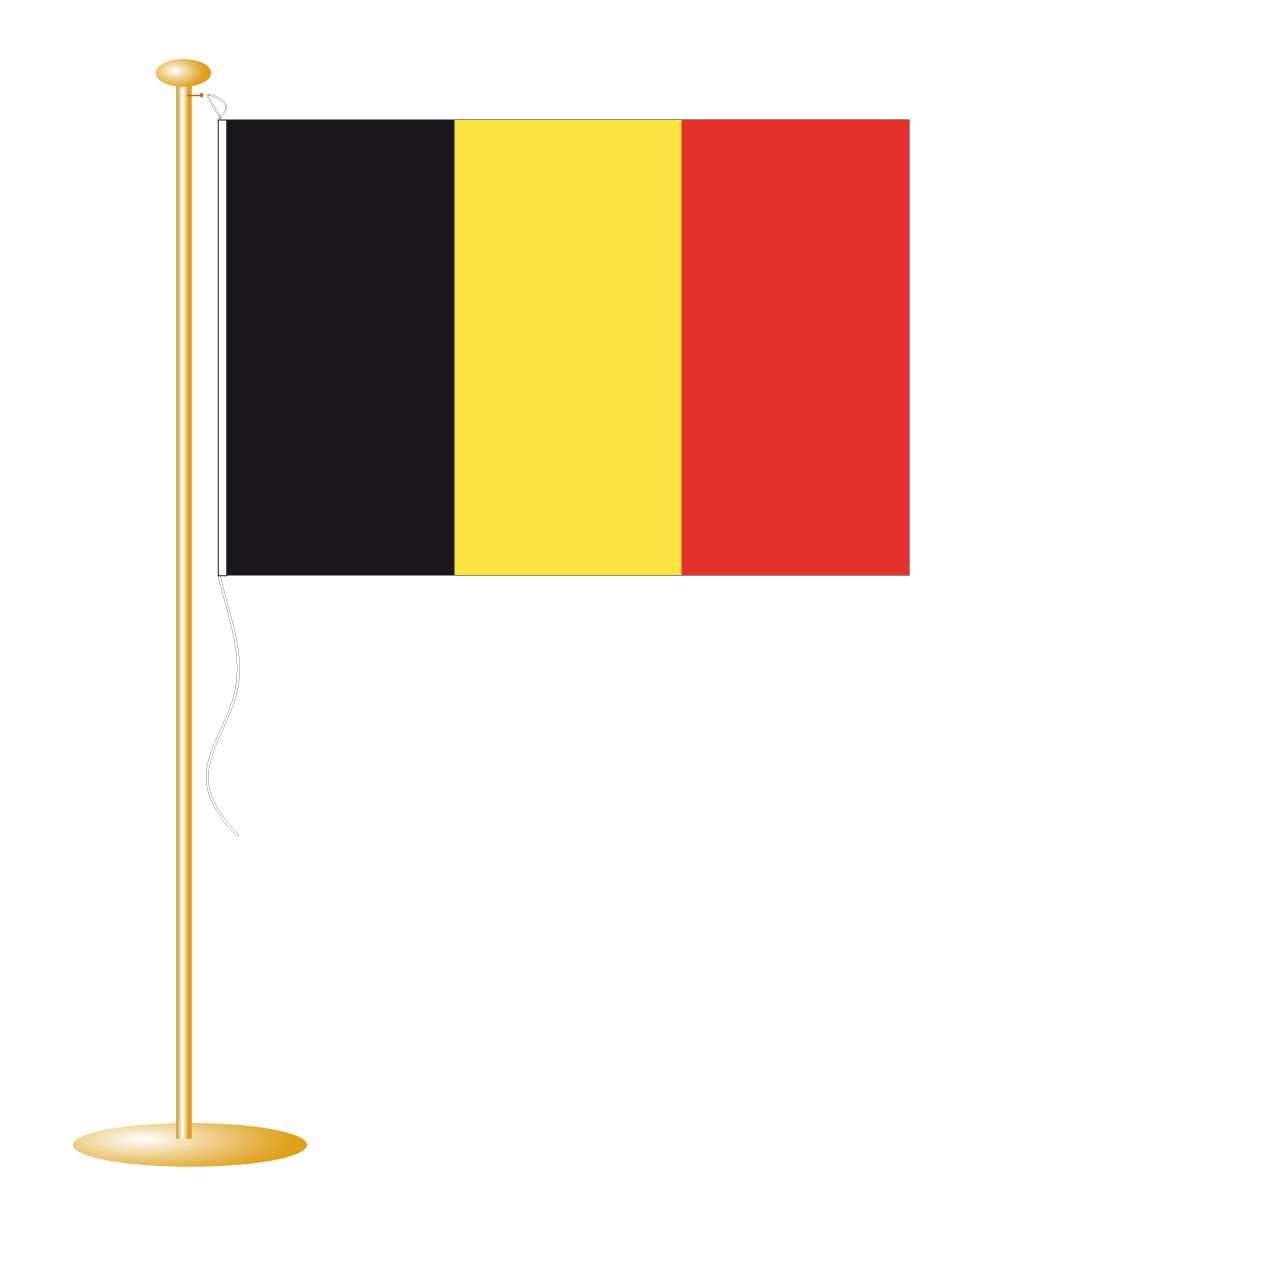 Tafelvlag België afm. 10x15cm